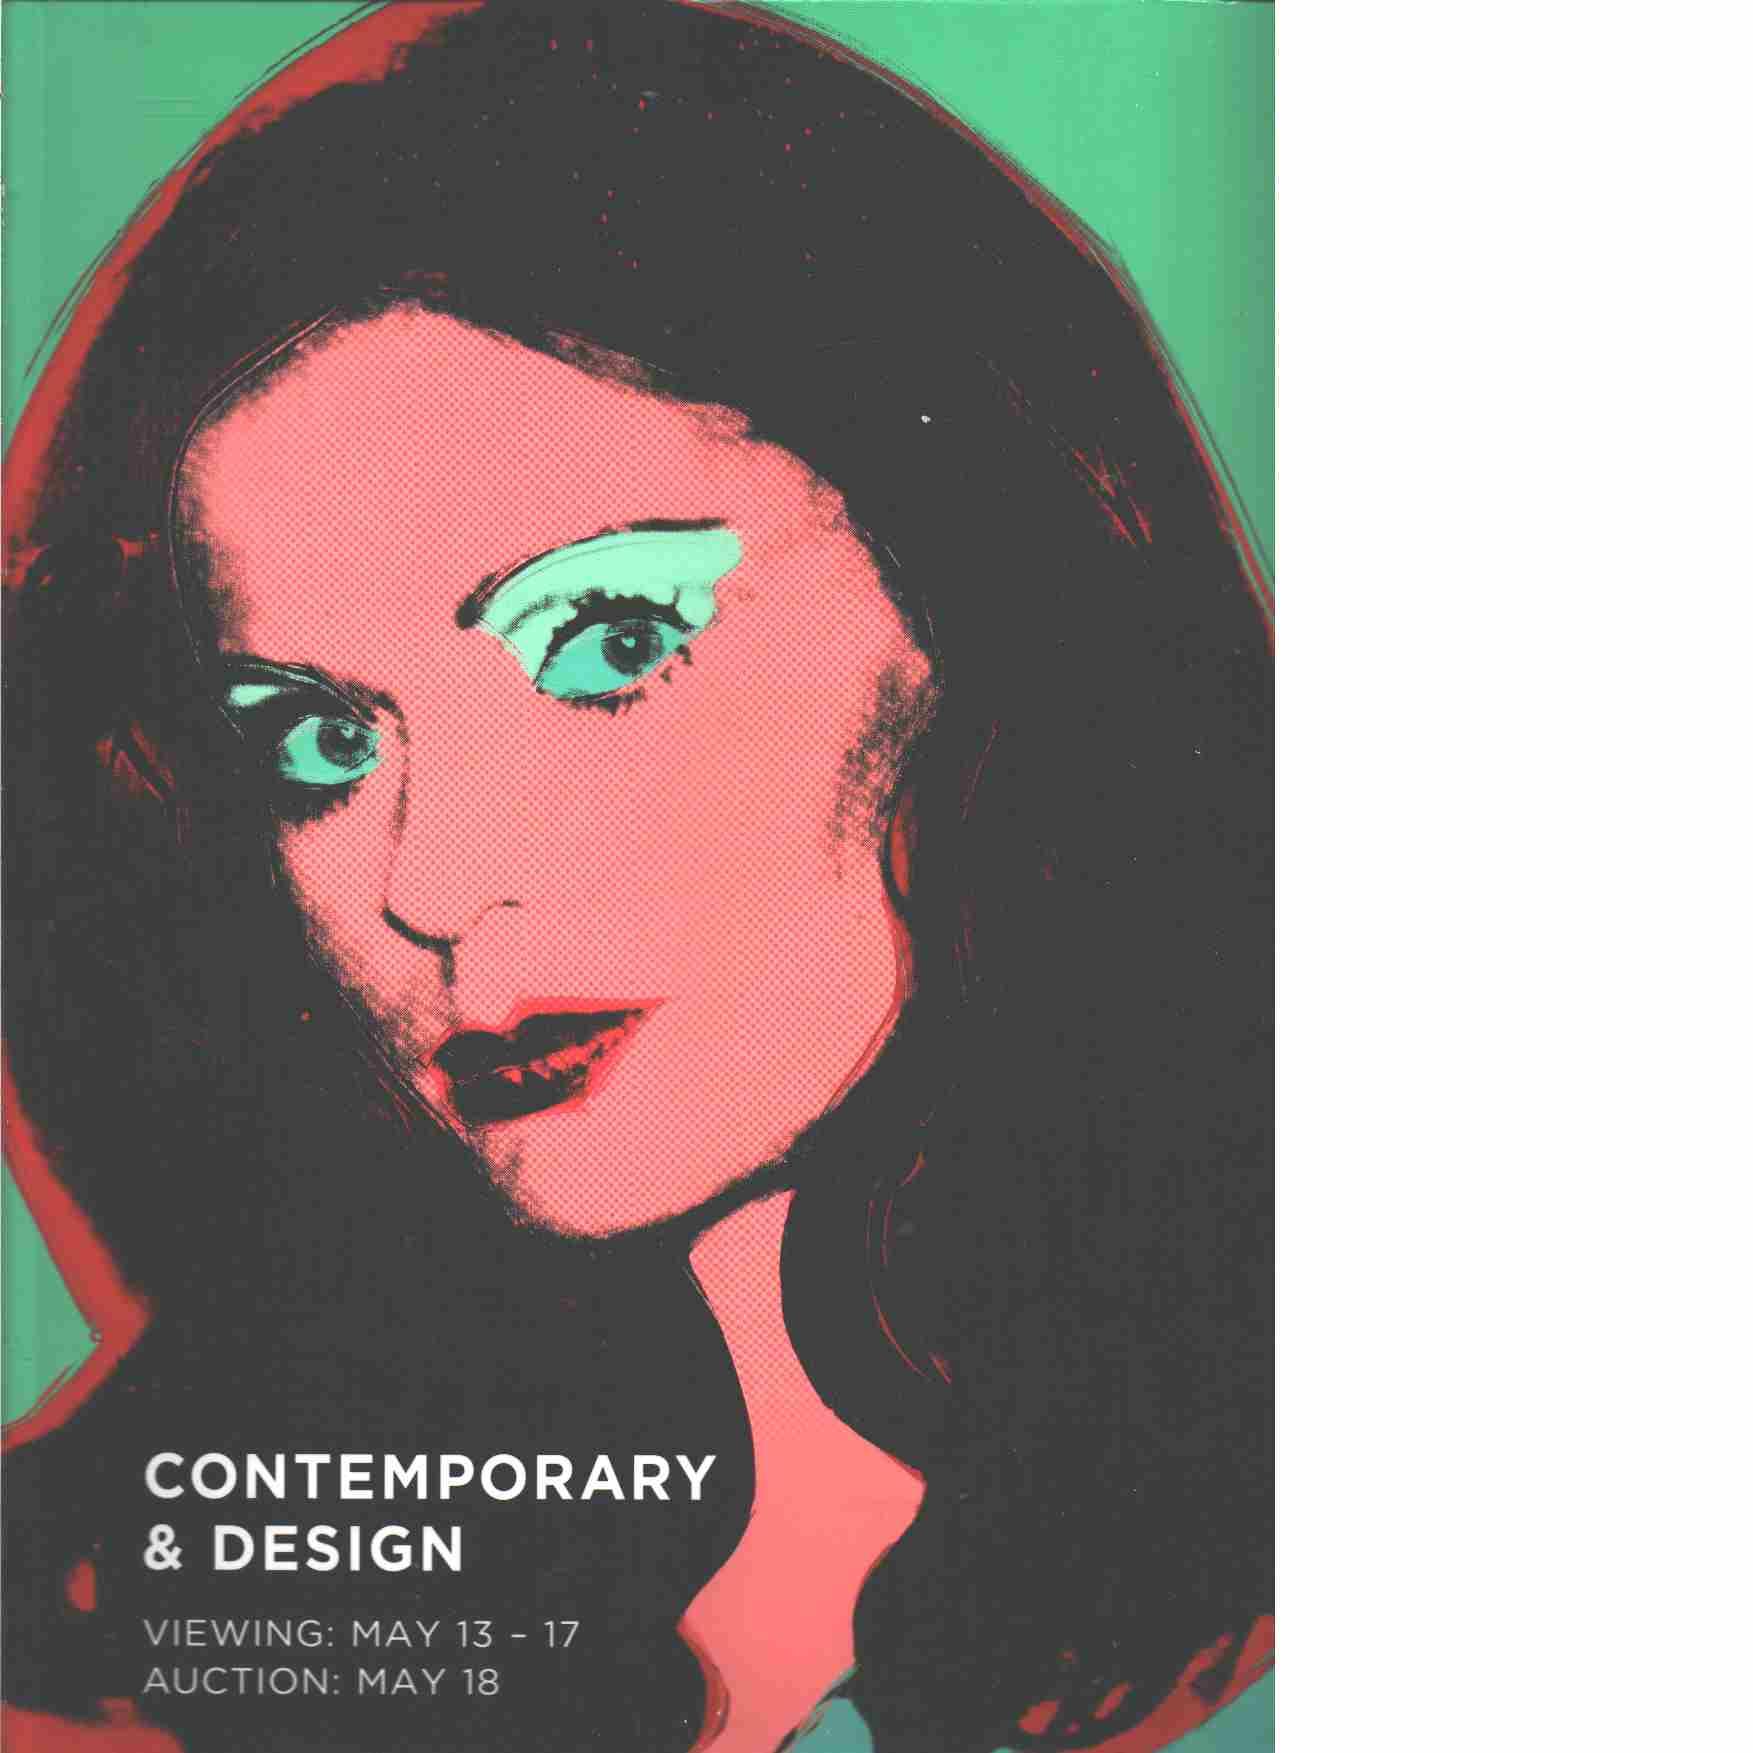 Contemporary & Design - Red.